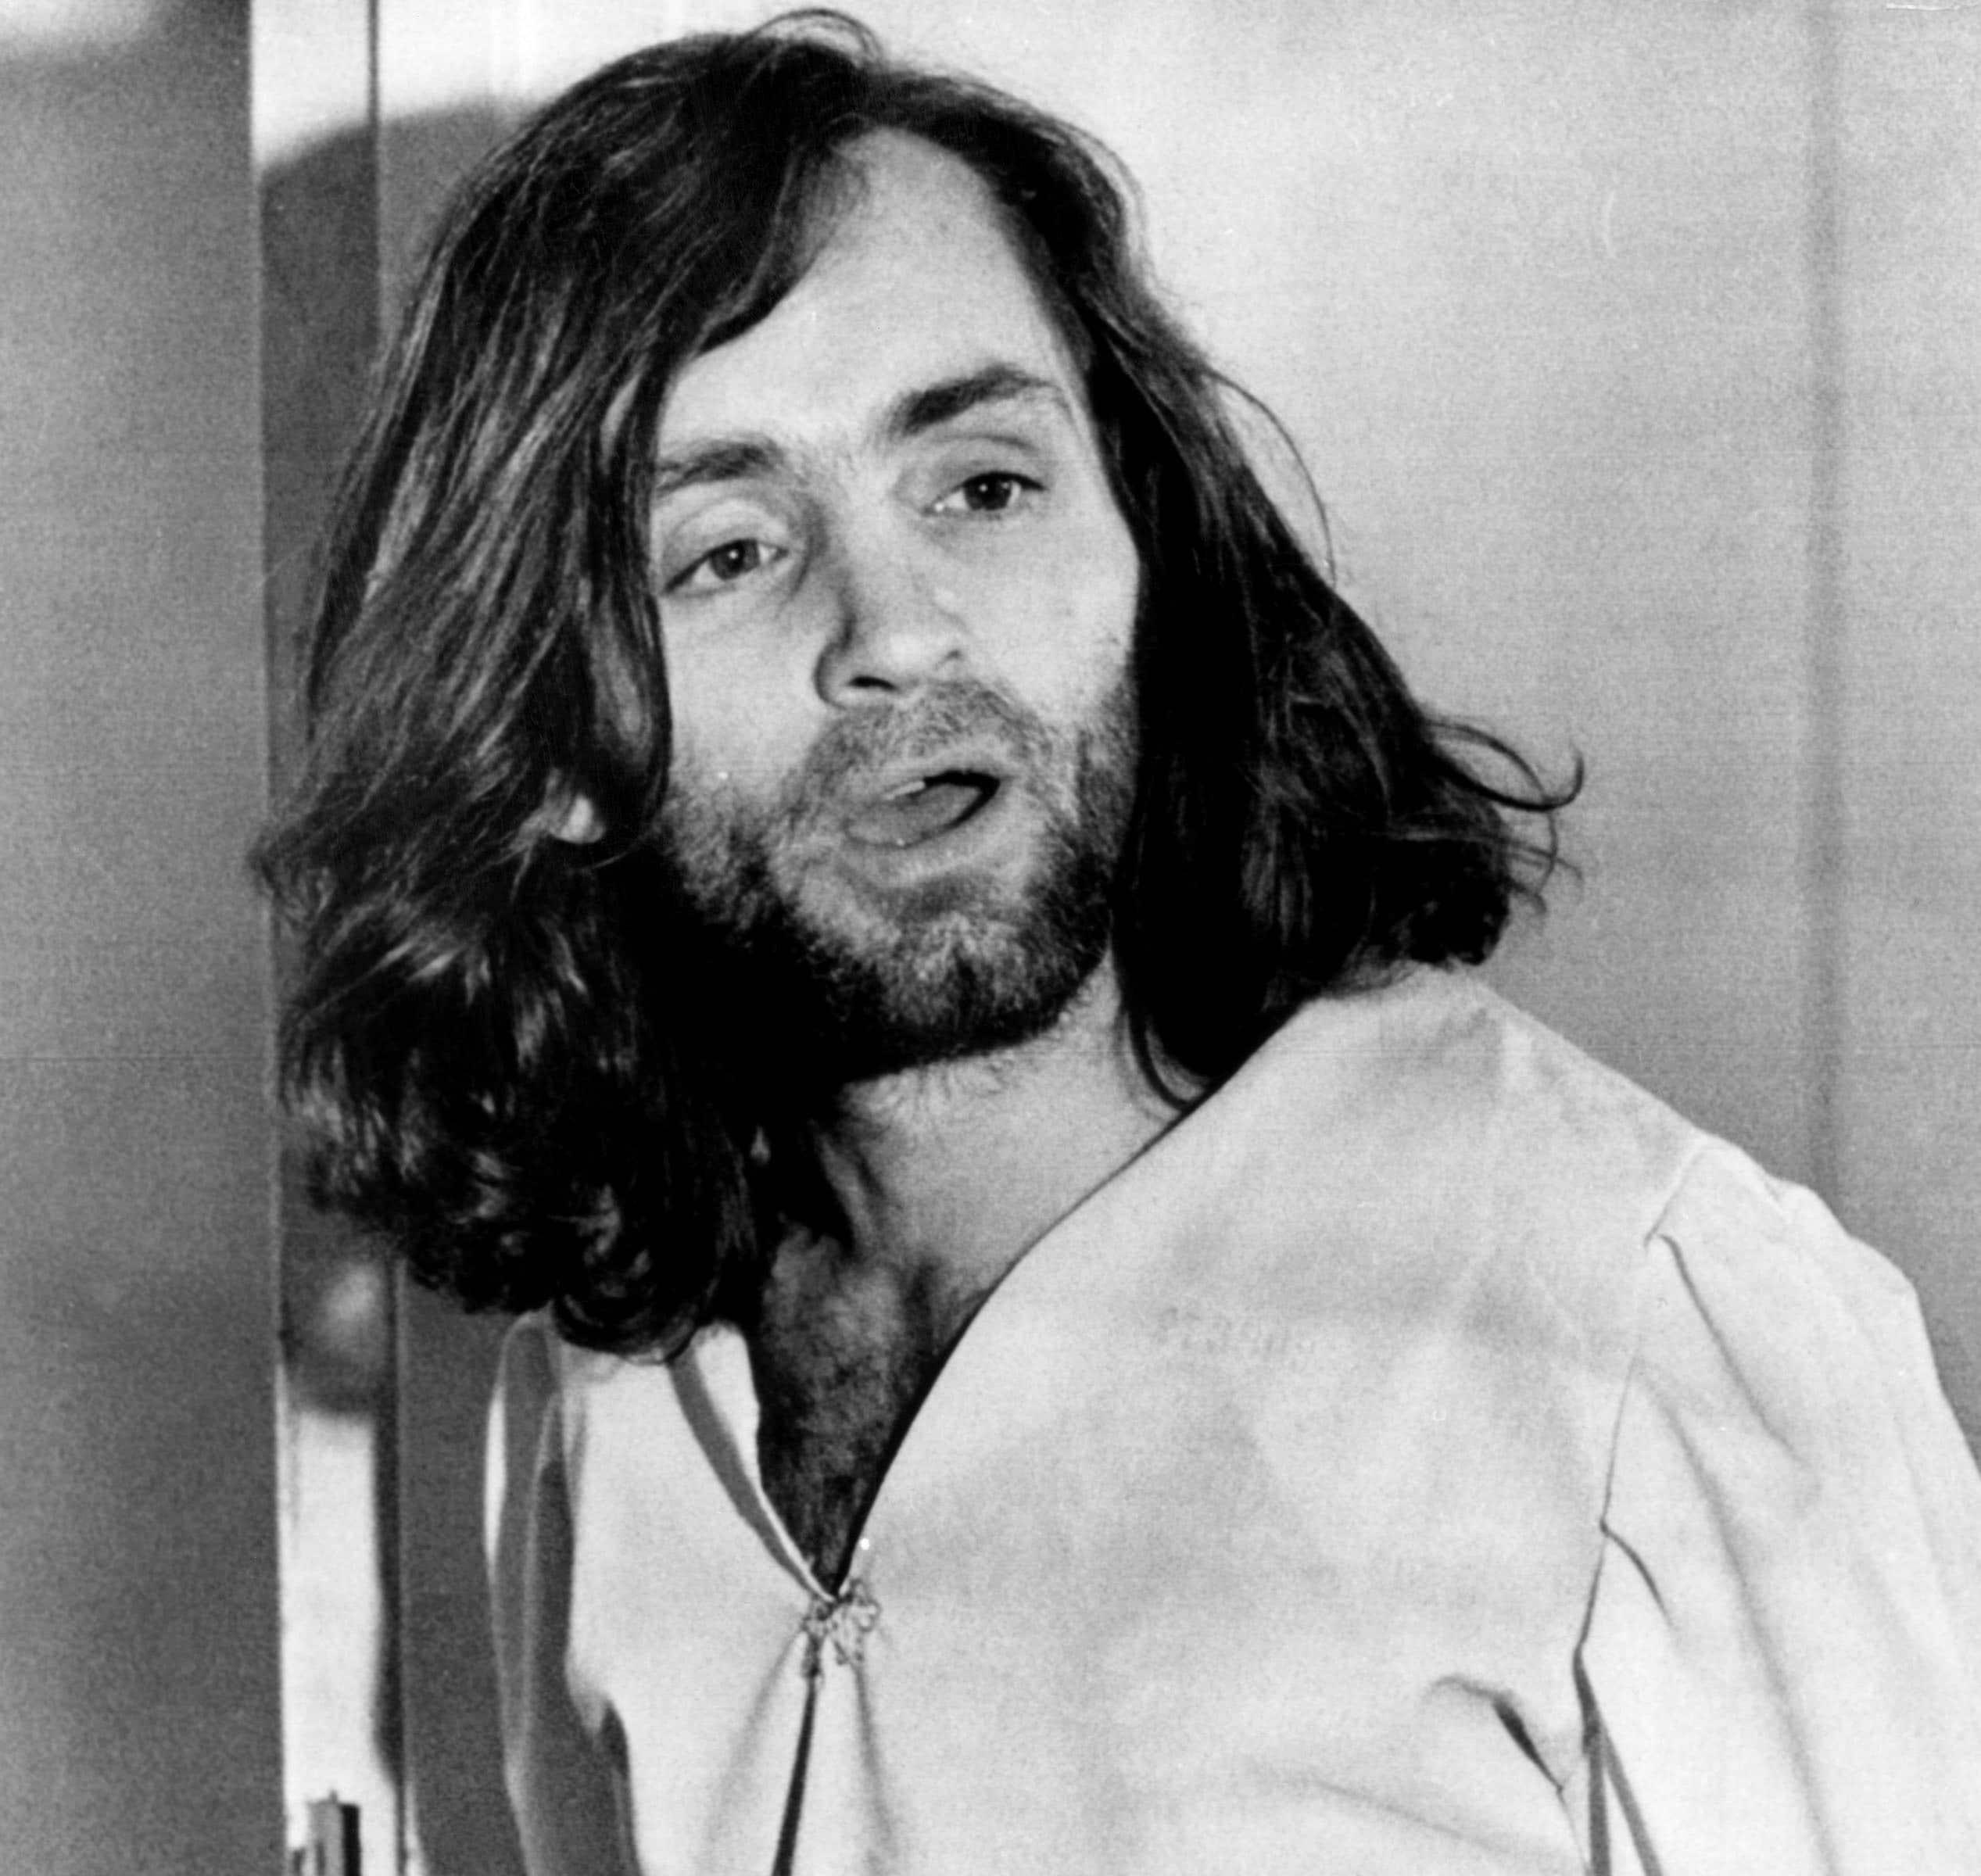 Charles Manson, cult leader, March 6, 1970